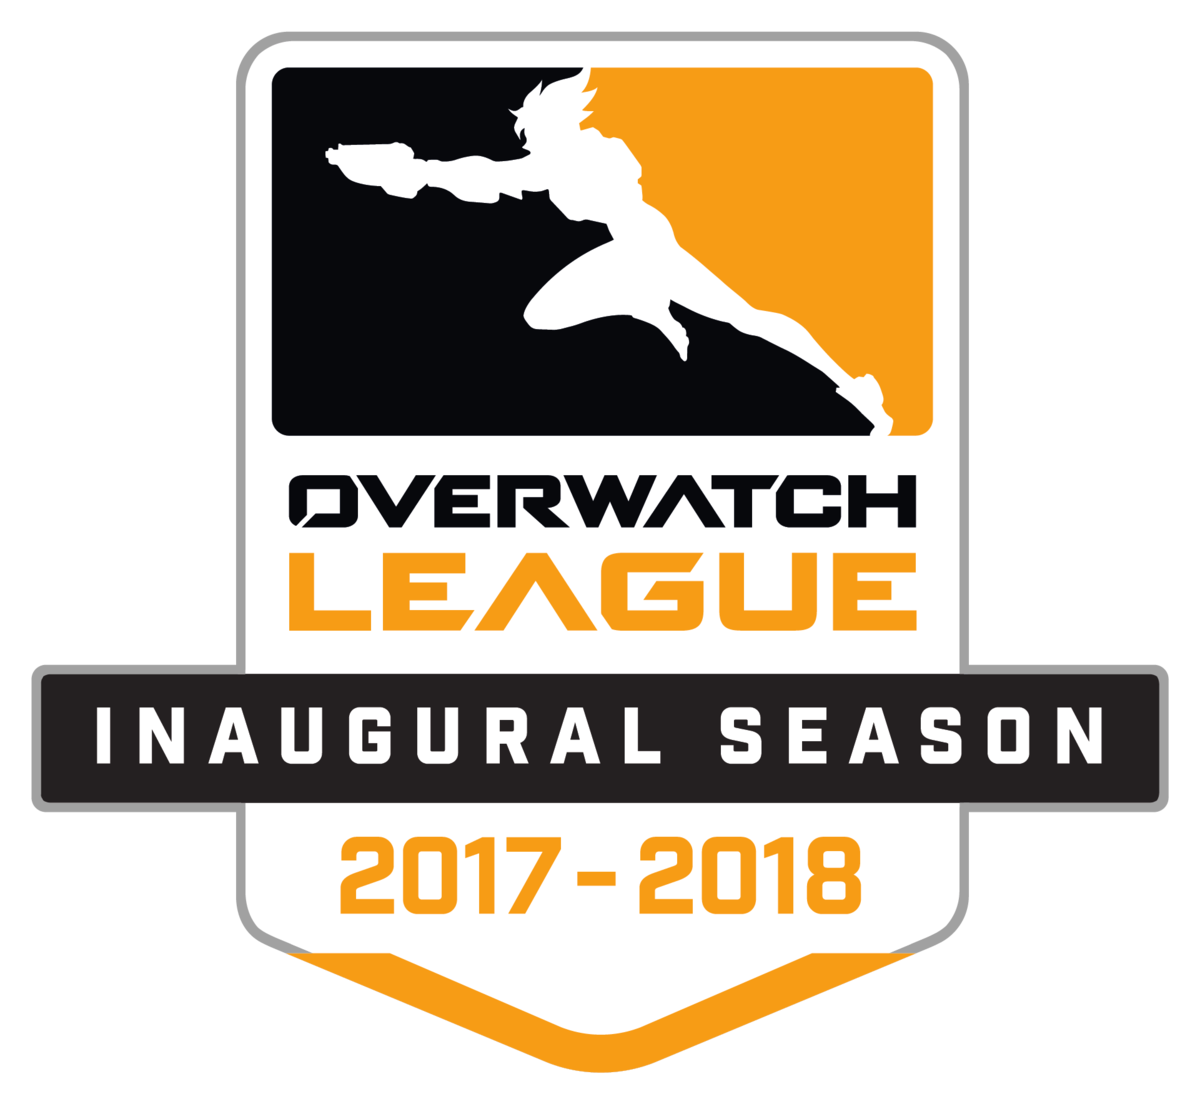 Overwatch League - Inaugural Season Playoffs